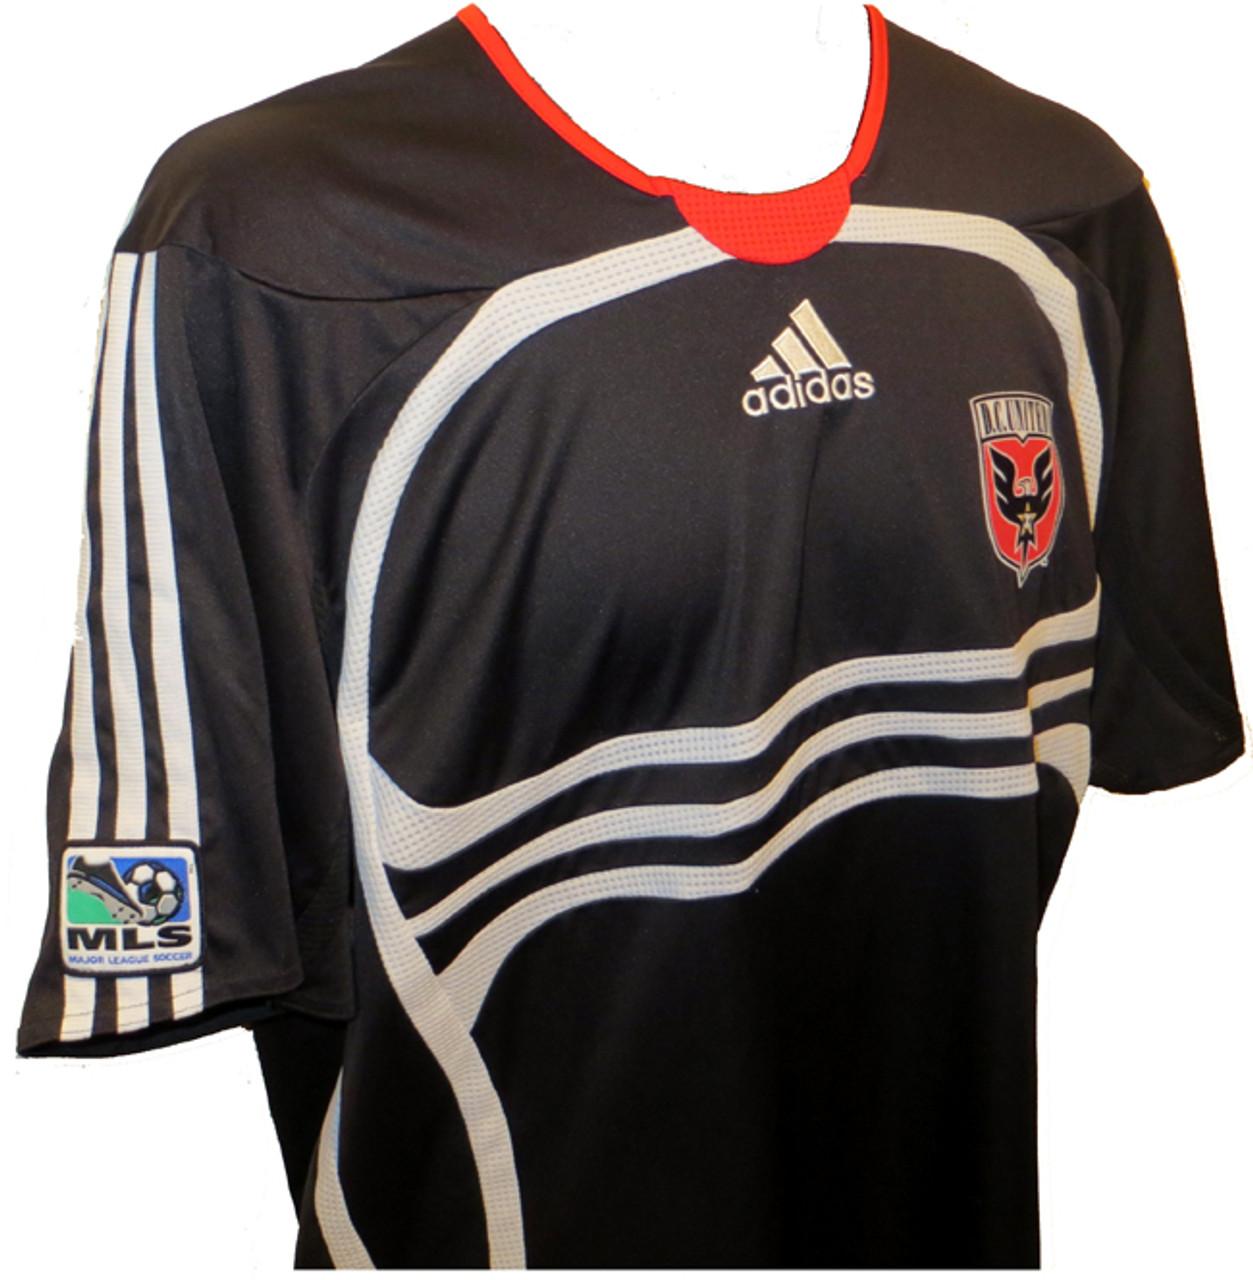 dc united jersey